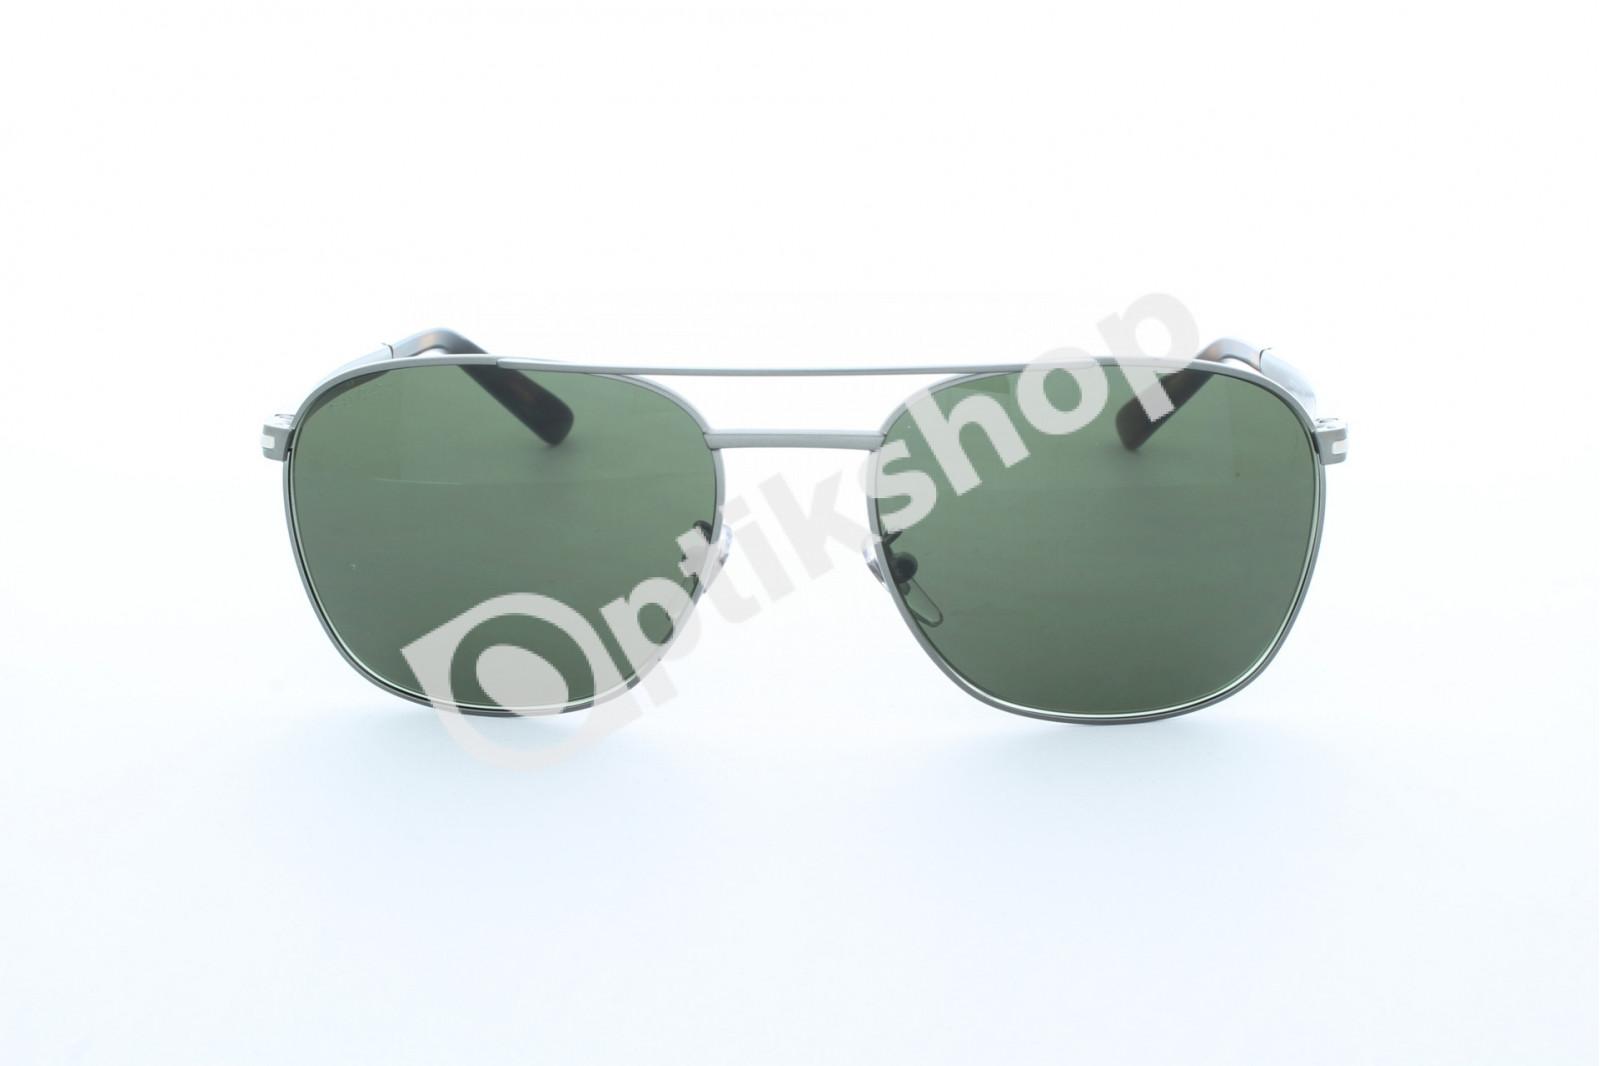 GG 2270 F S VSV1E 59-19-145 napszemüvegek e315a1a103